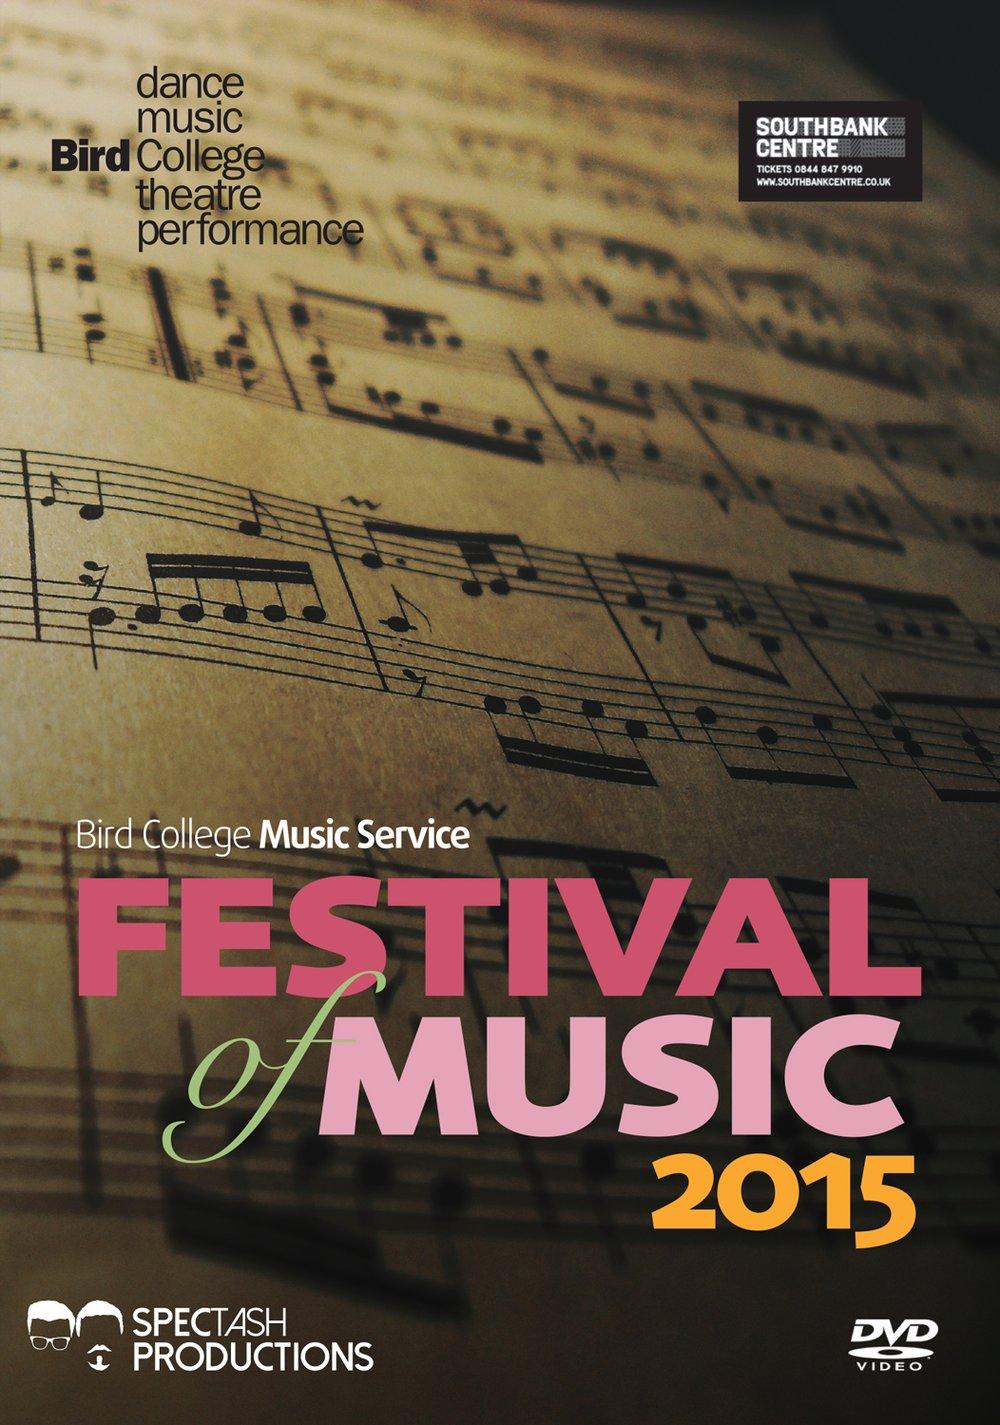 Image of Festival of Music 2015 - Bird College